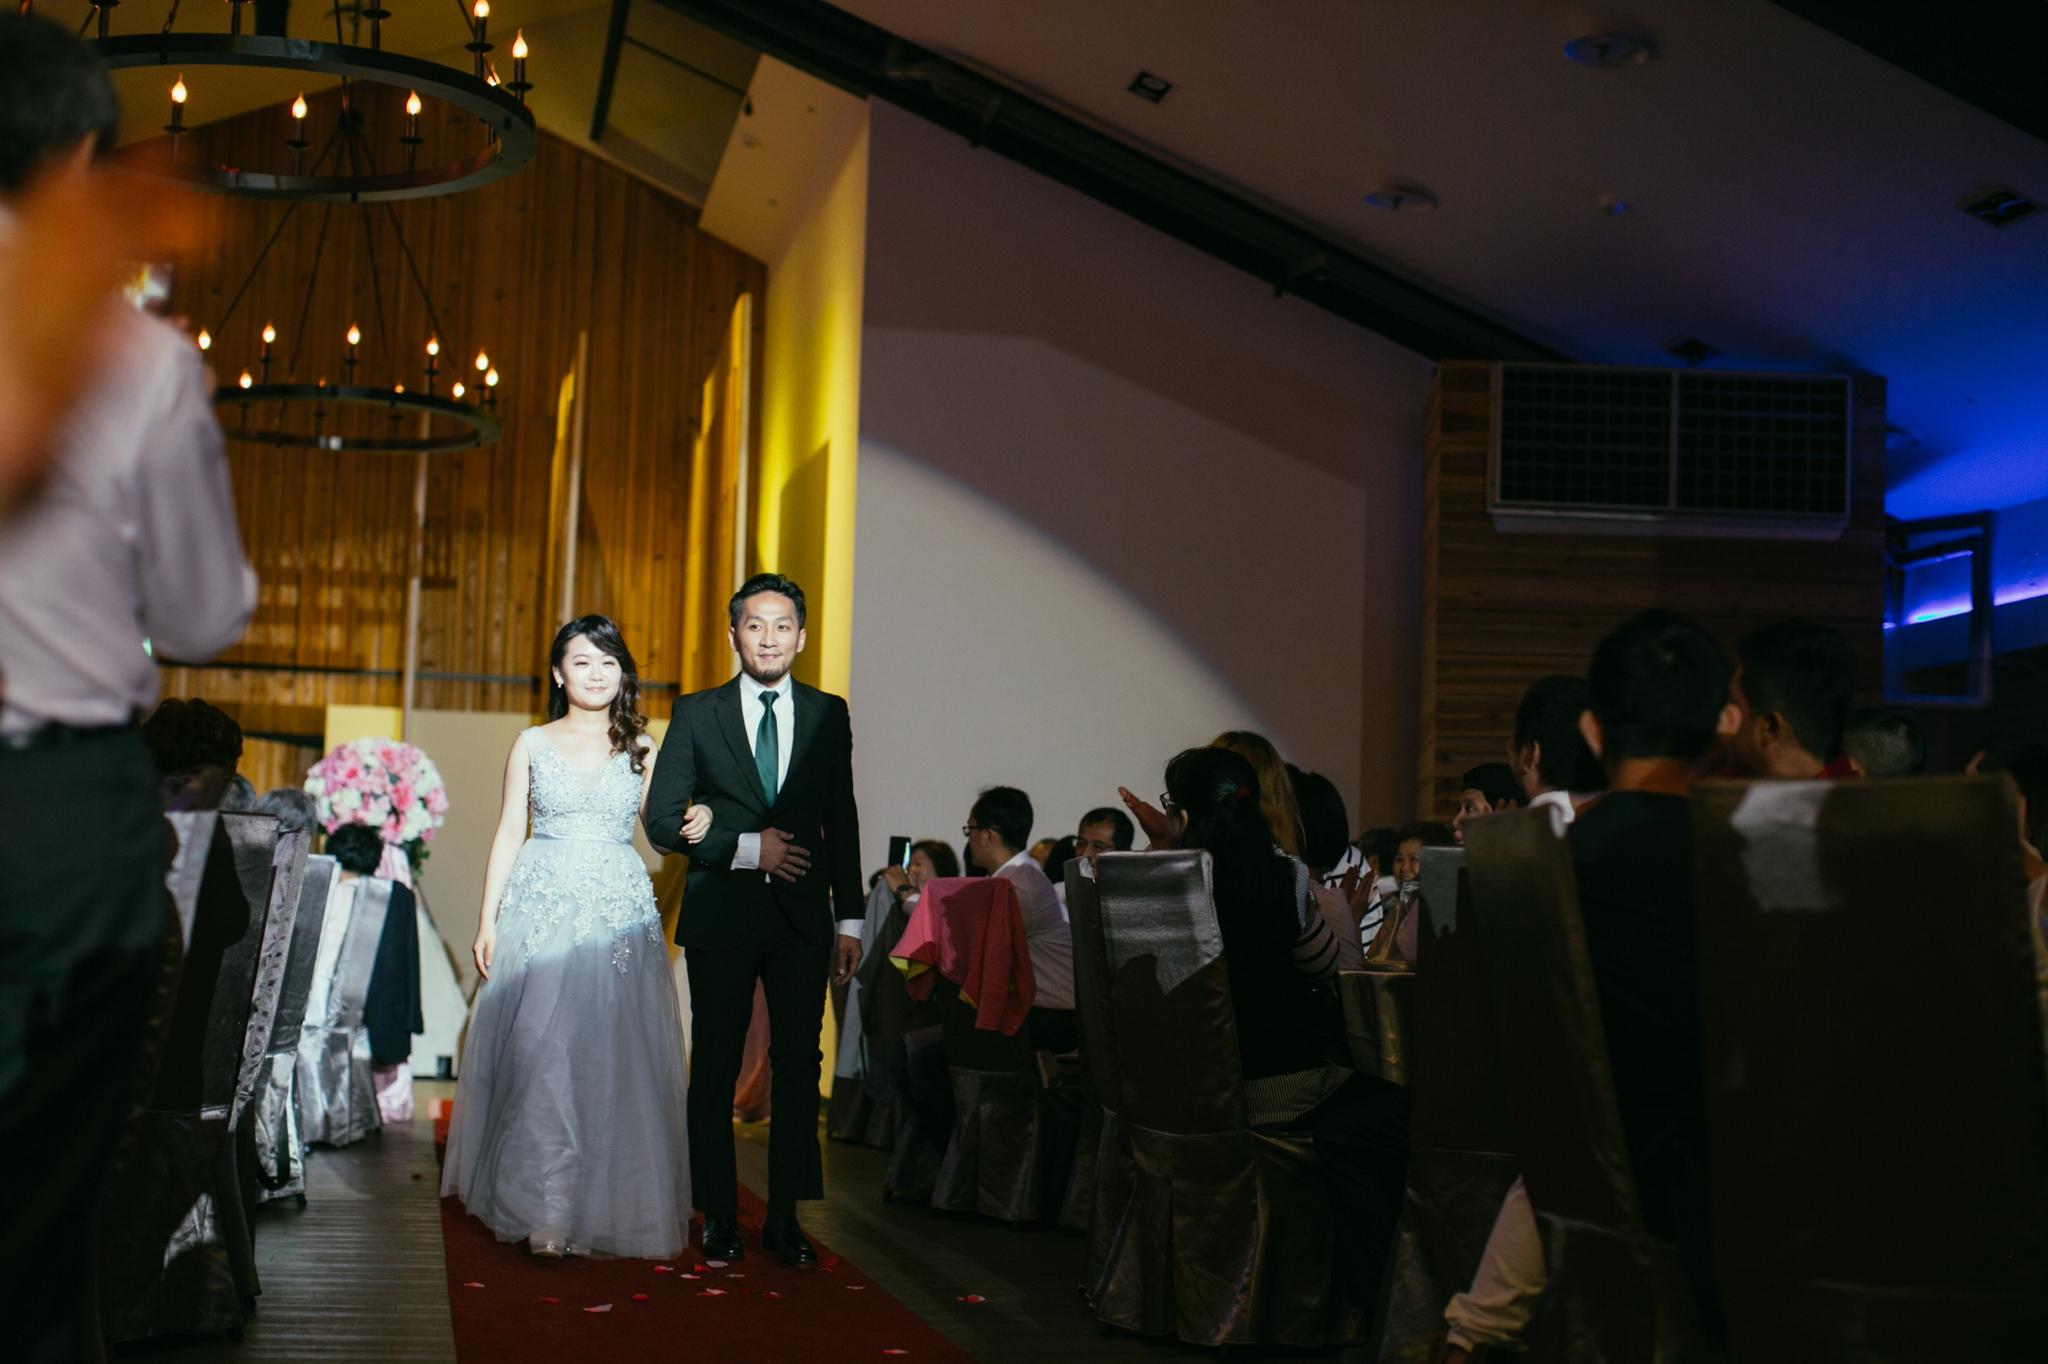 Tina+Nash-wedding-台北婚禮迎娶晚宴-新莊終身大事-116.jpg